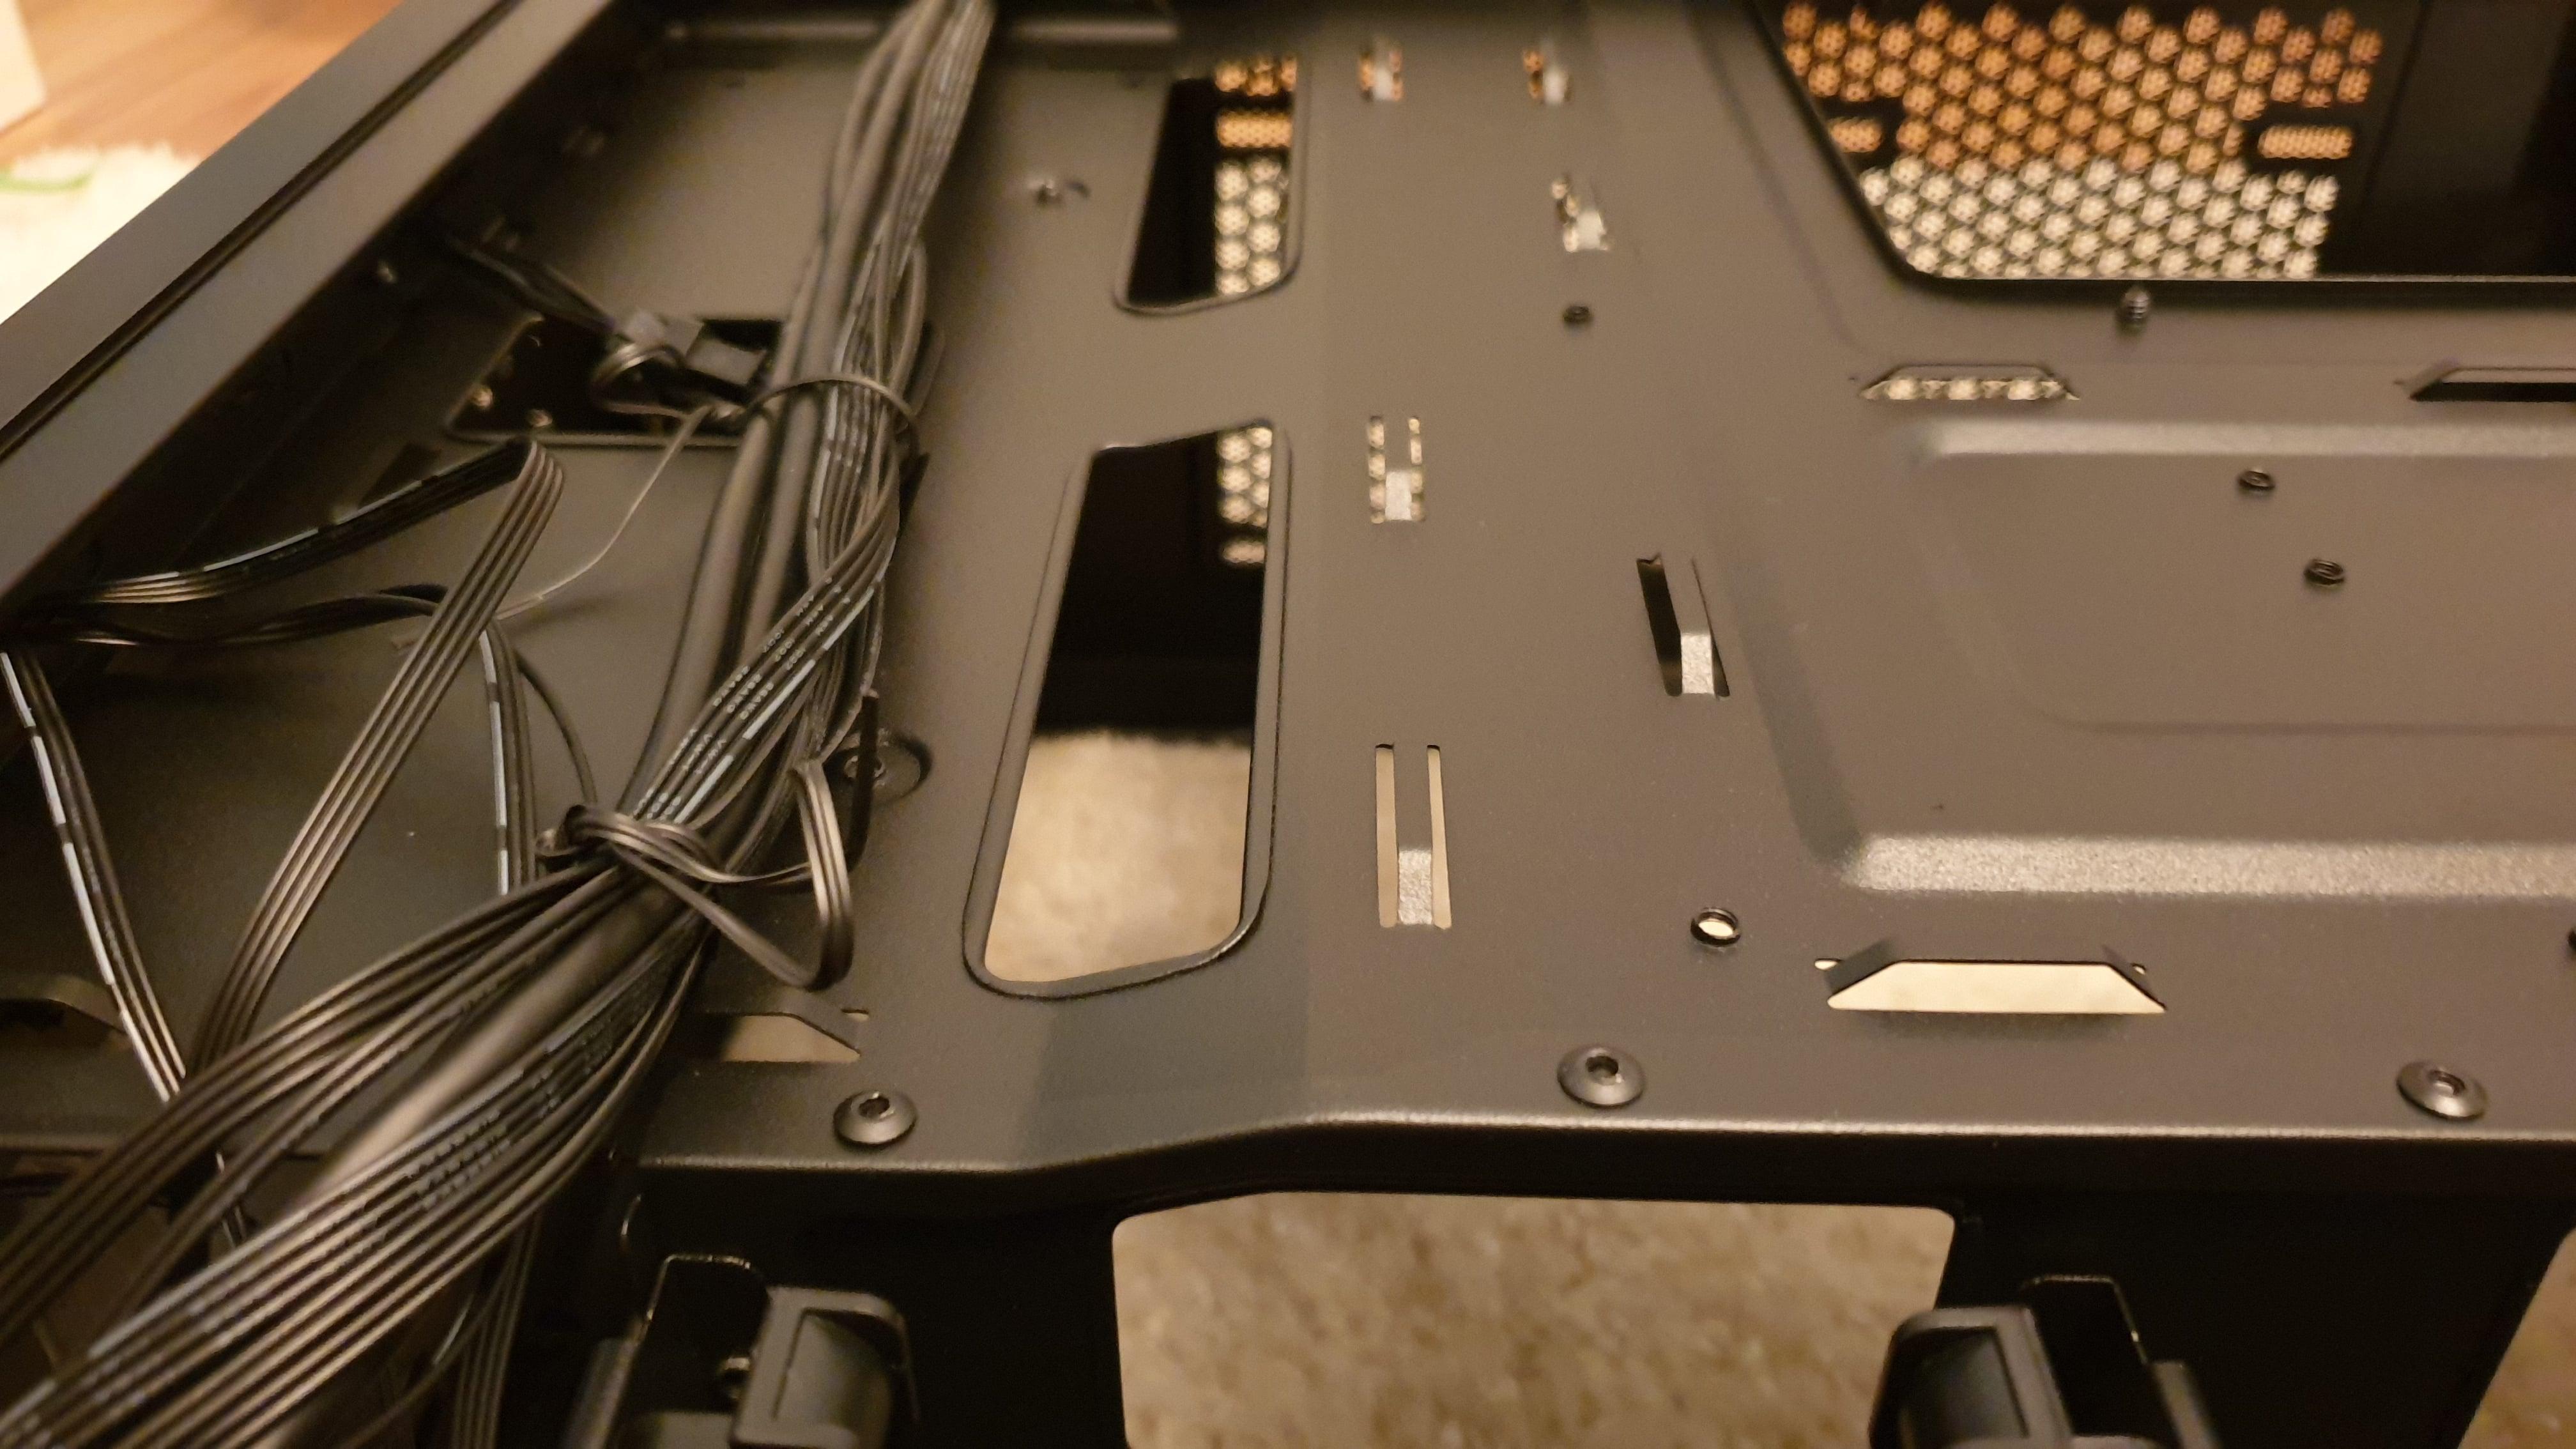 Test obudowy Cooler Master MasterBox K500 Phantom Gaming Edition - tak długa nazwa musi zwiastować cuda? 28